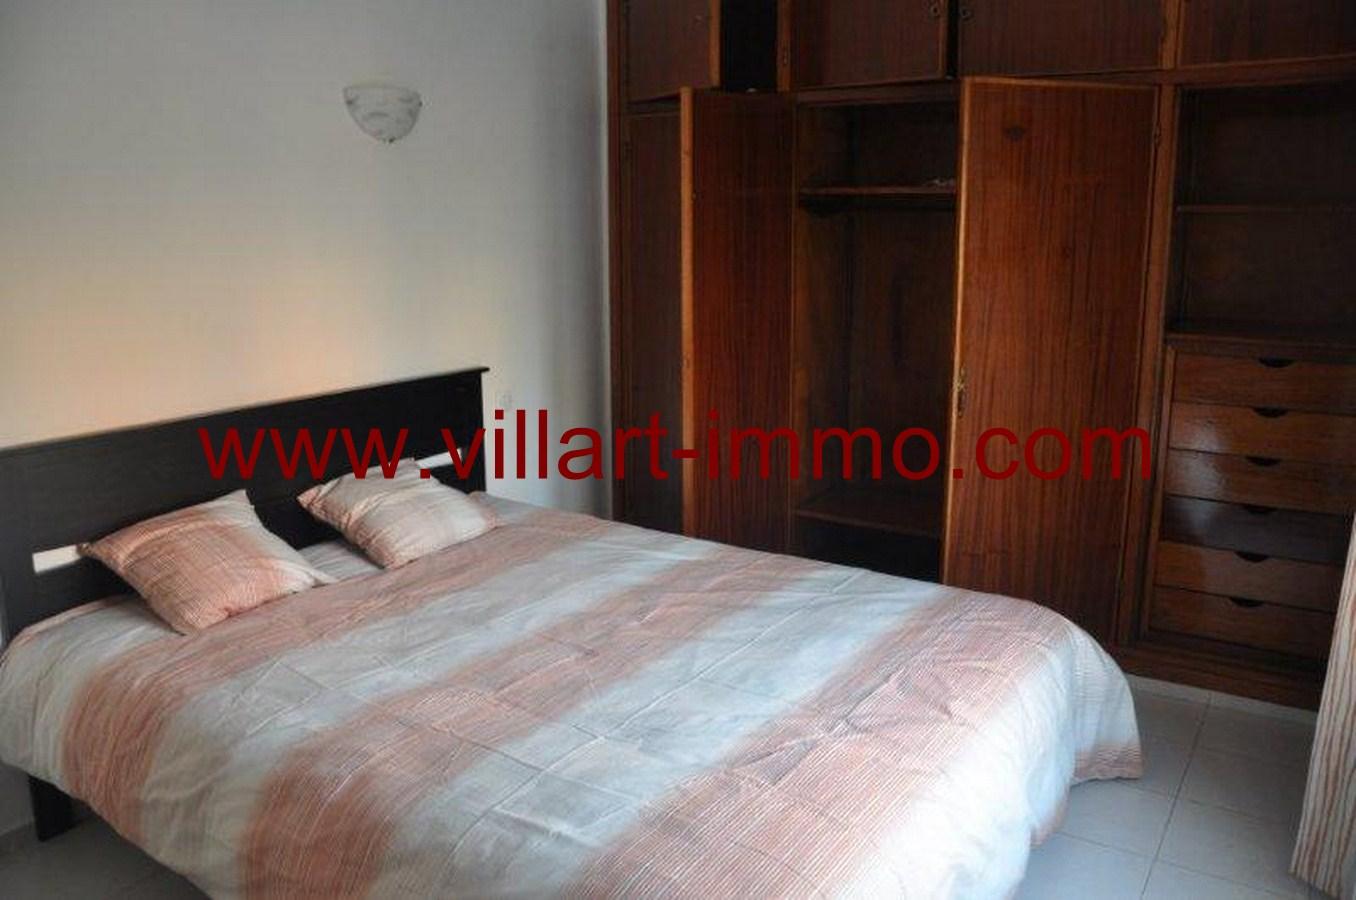 11-Location-Villa-Meublé-Malabata-Chambre 2-Villart immo-Tanger-LV126